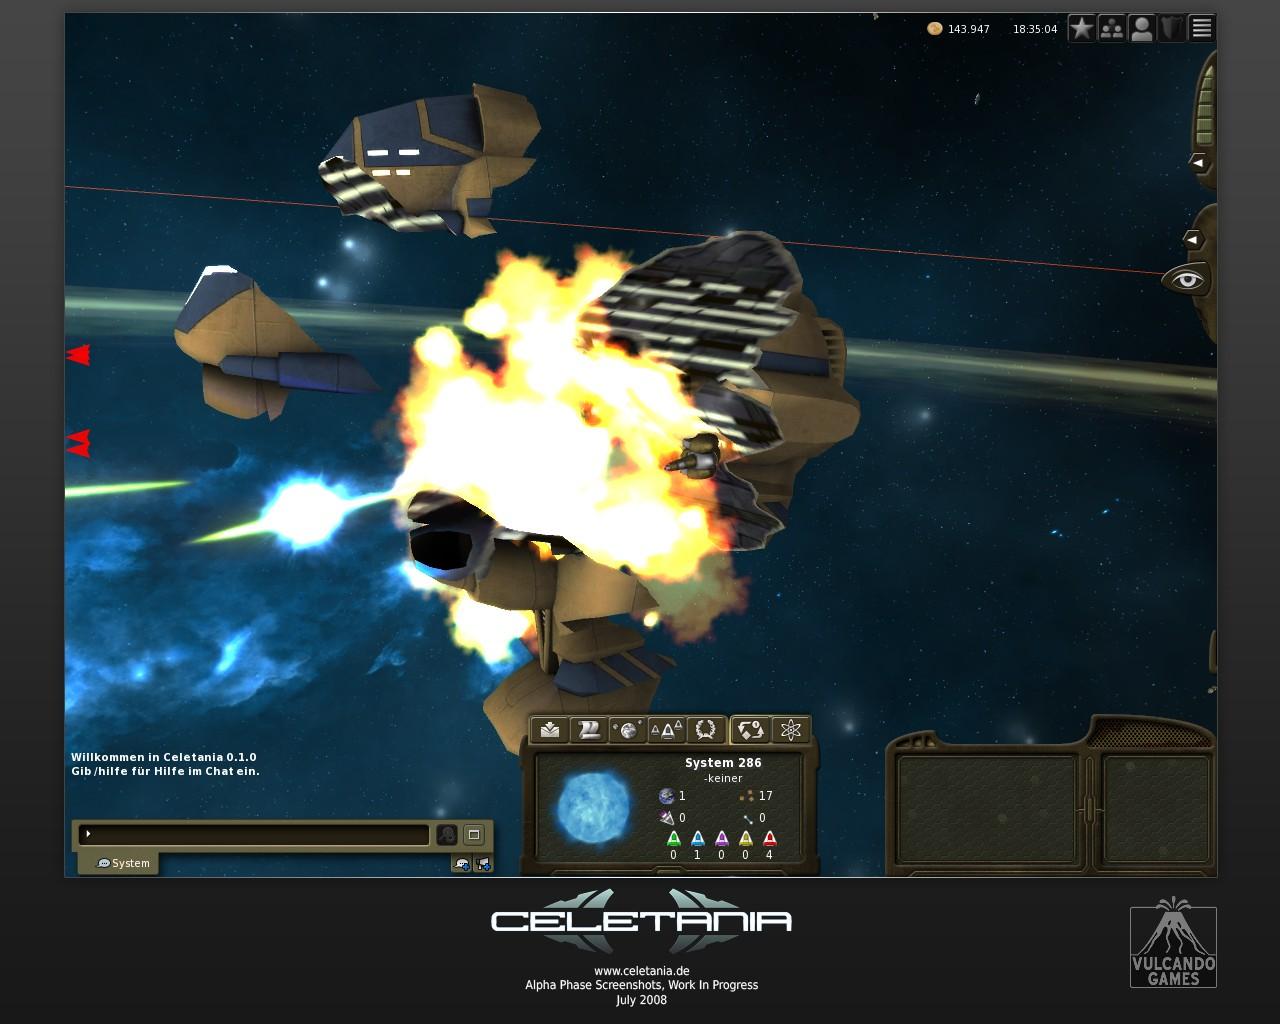 Celetania - Gameplay